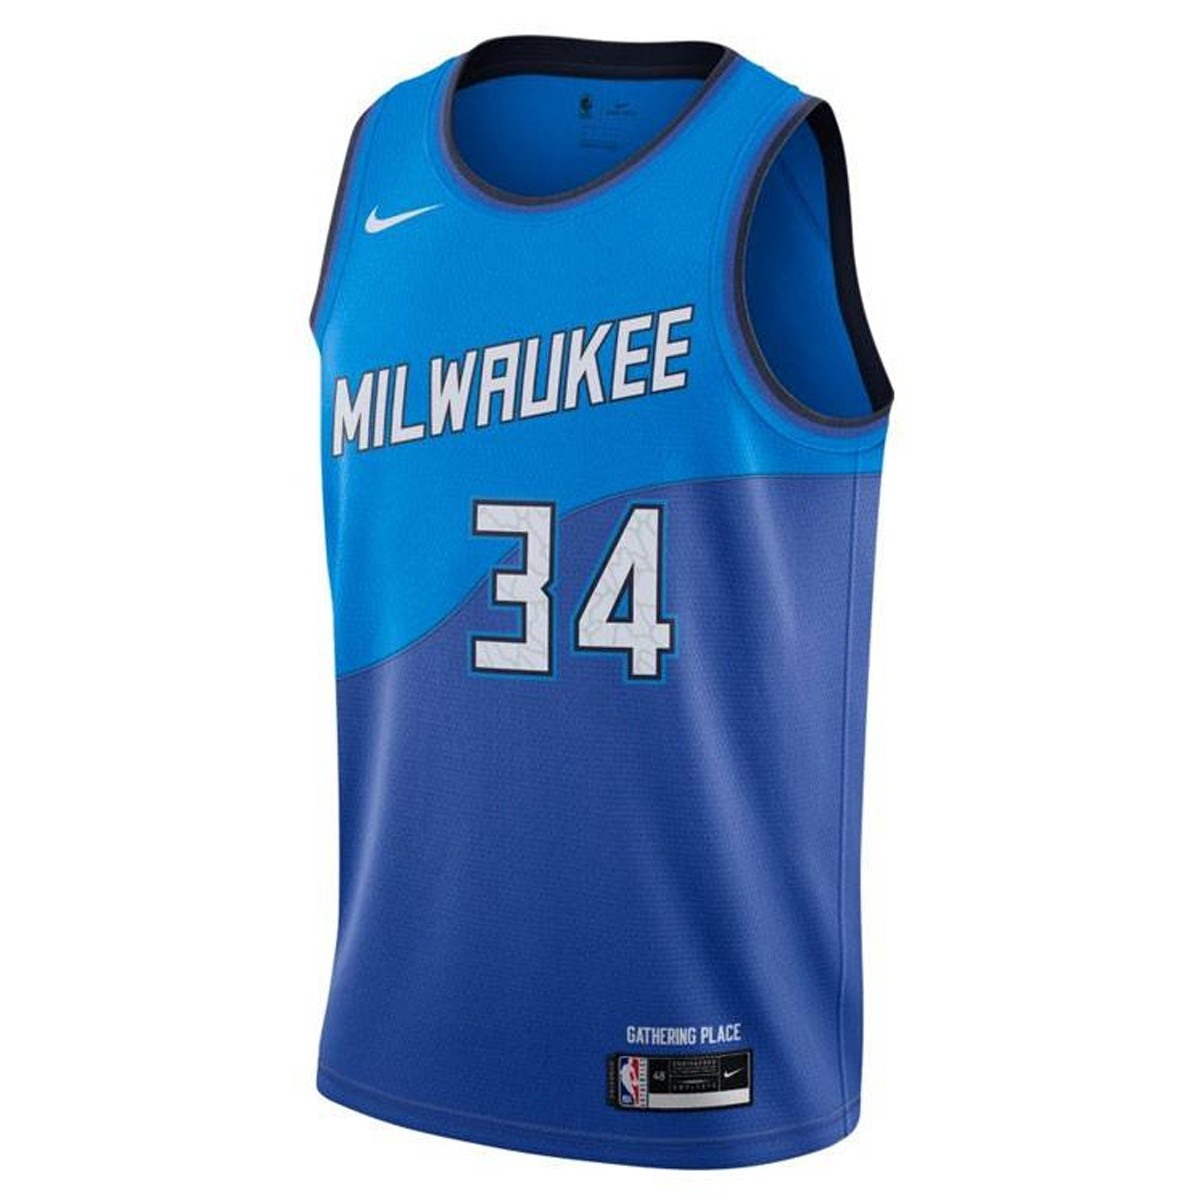 Nike Jr NBA Milwaukee Bucks Swingman Jersey Giannis Antetokounmpo 'City Edition'